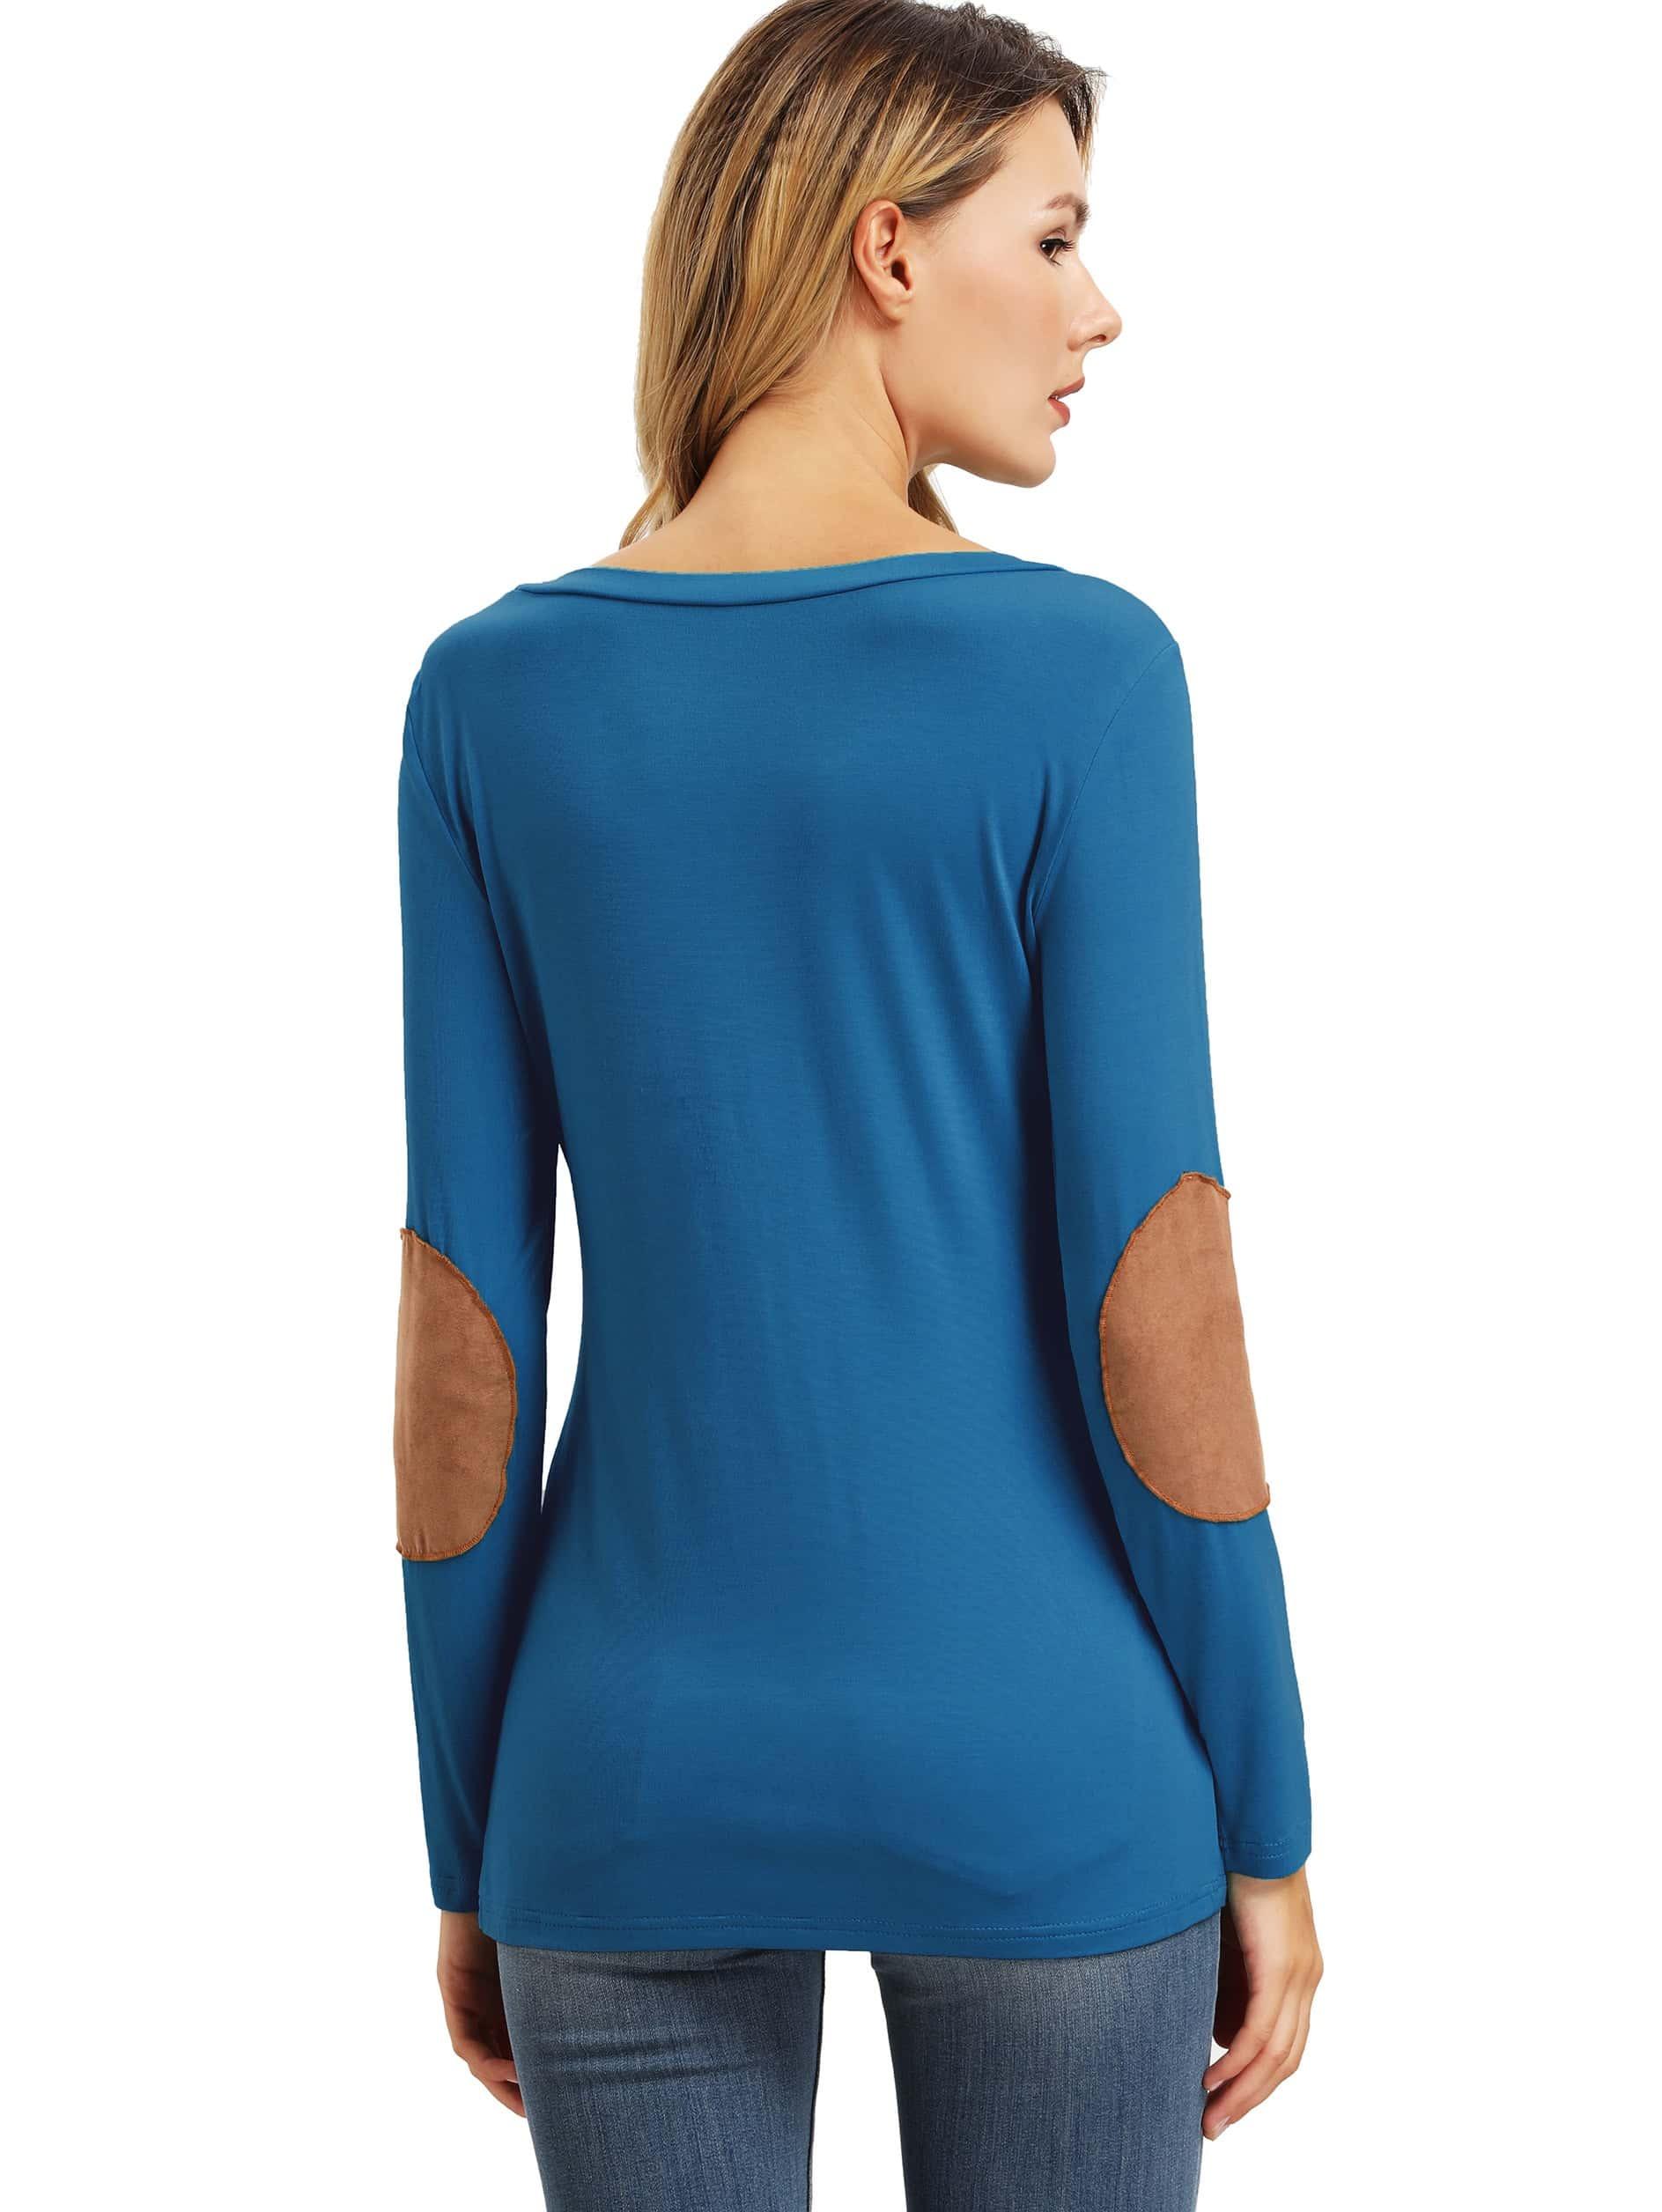 Blue Long Sleeve Elbow Patch T Shirt